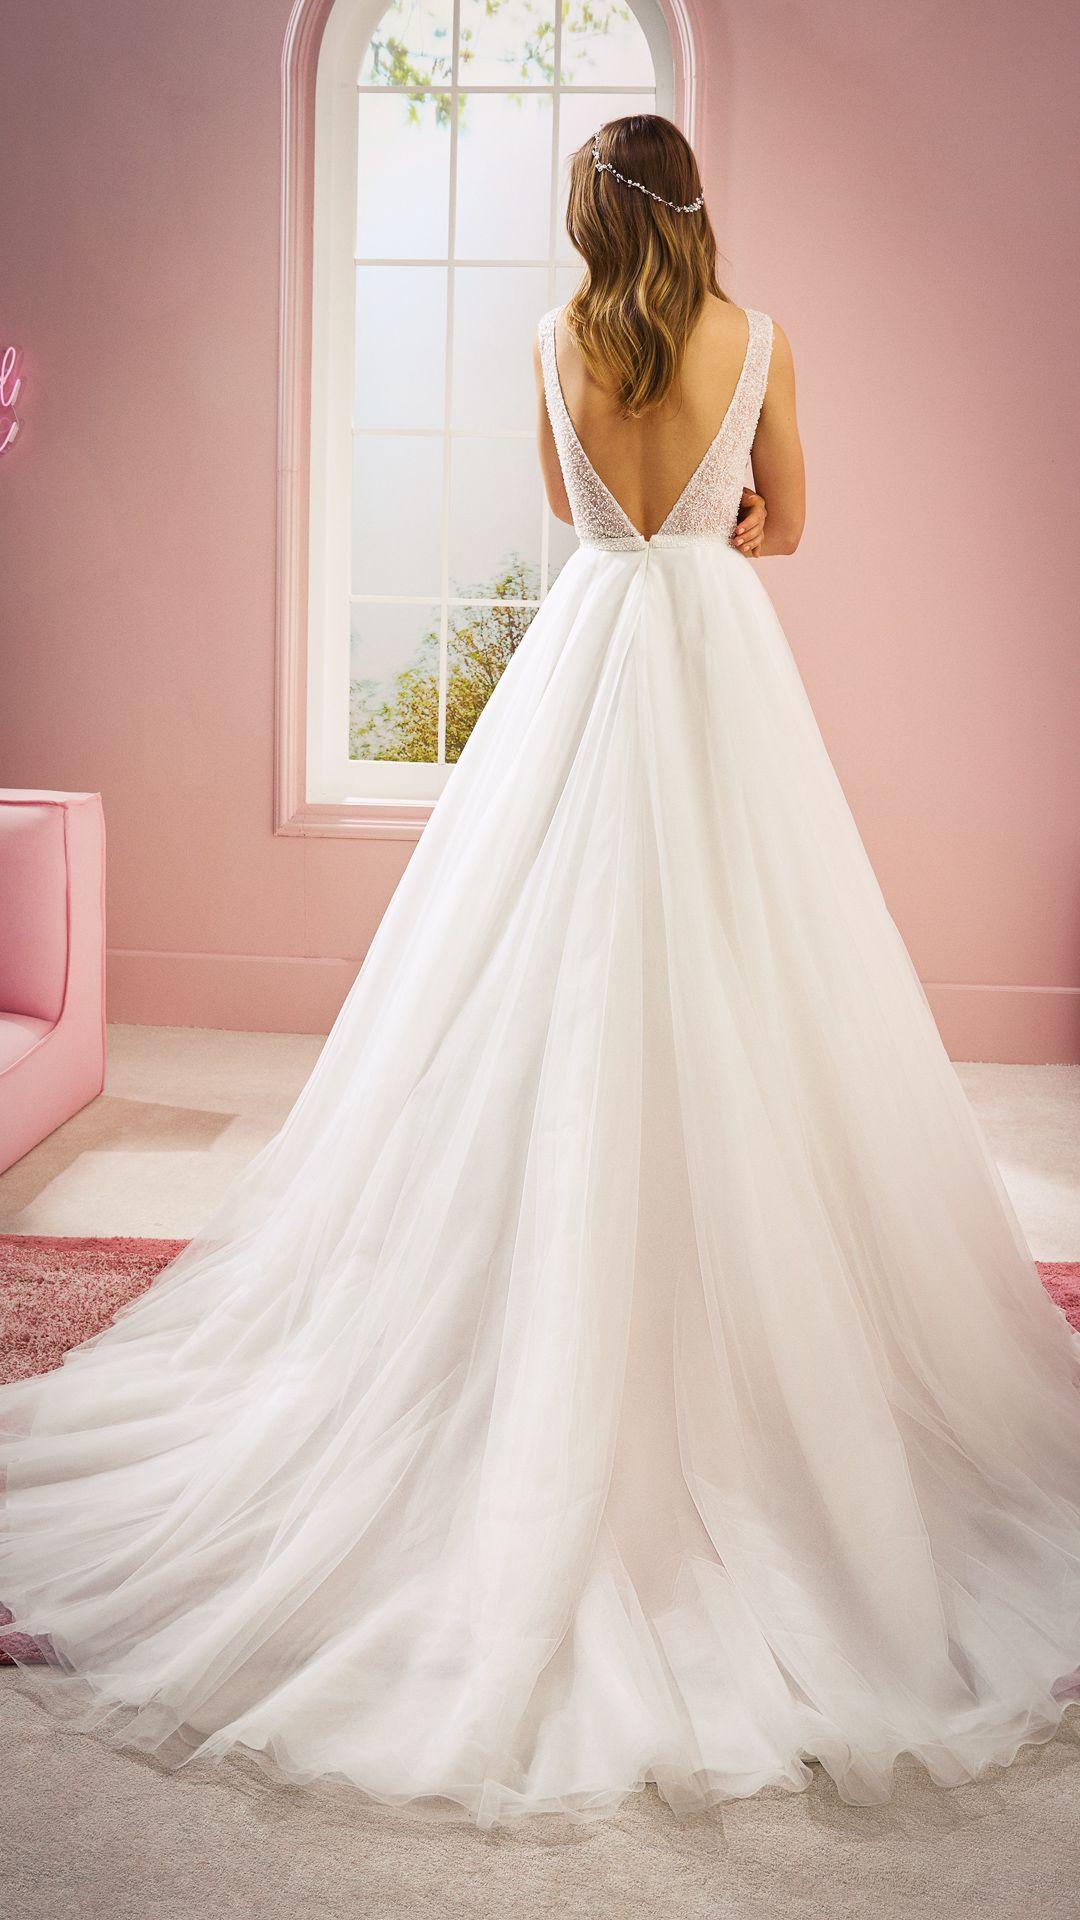 Hochzeitskleider 10 White One Kollektion Modell: GLORIA-C